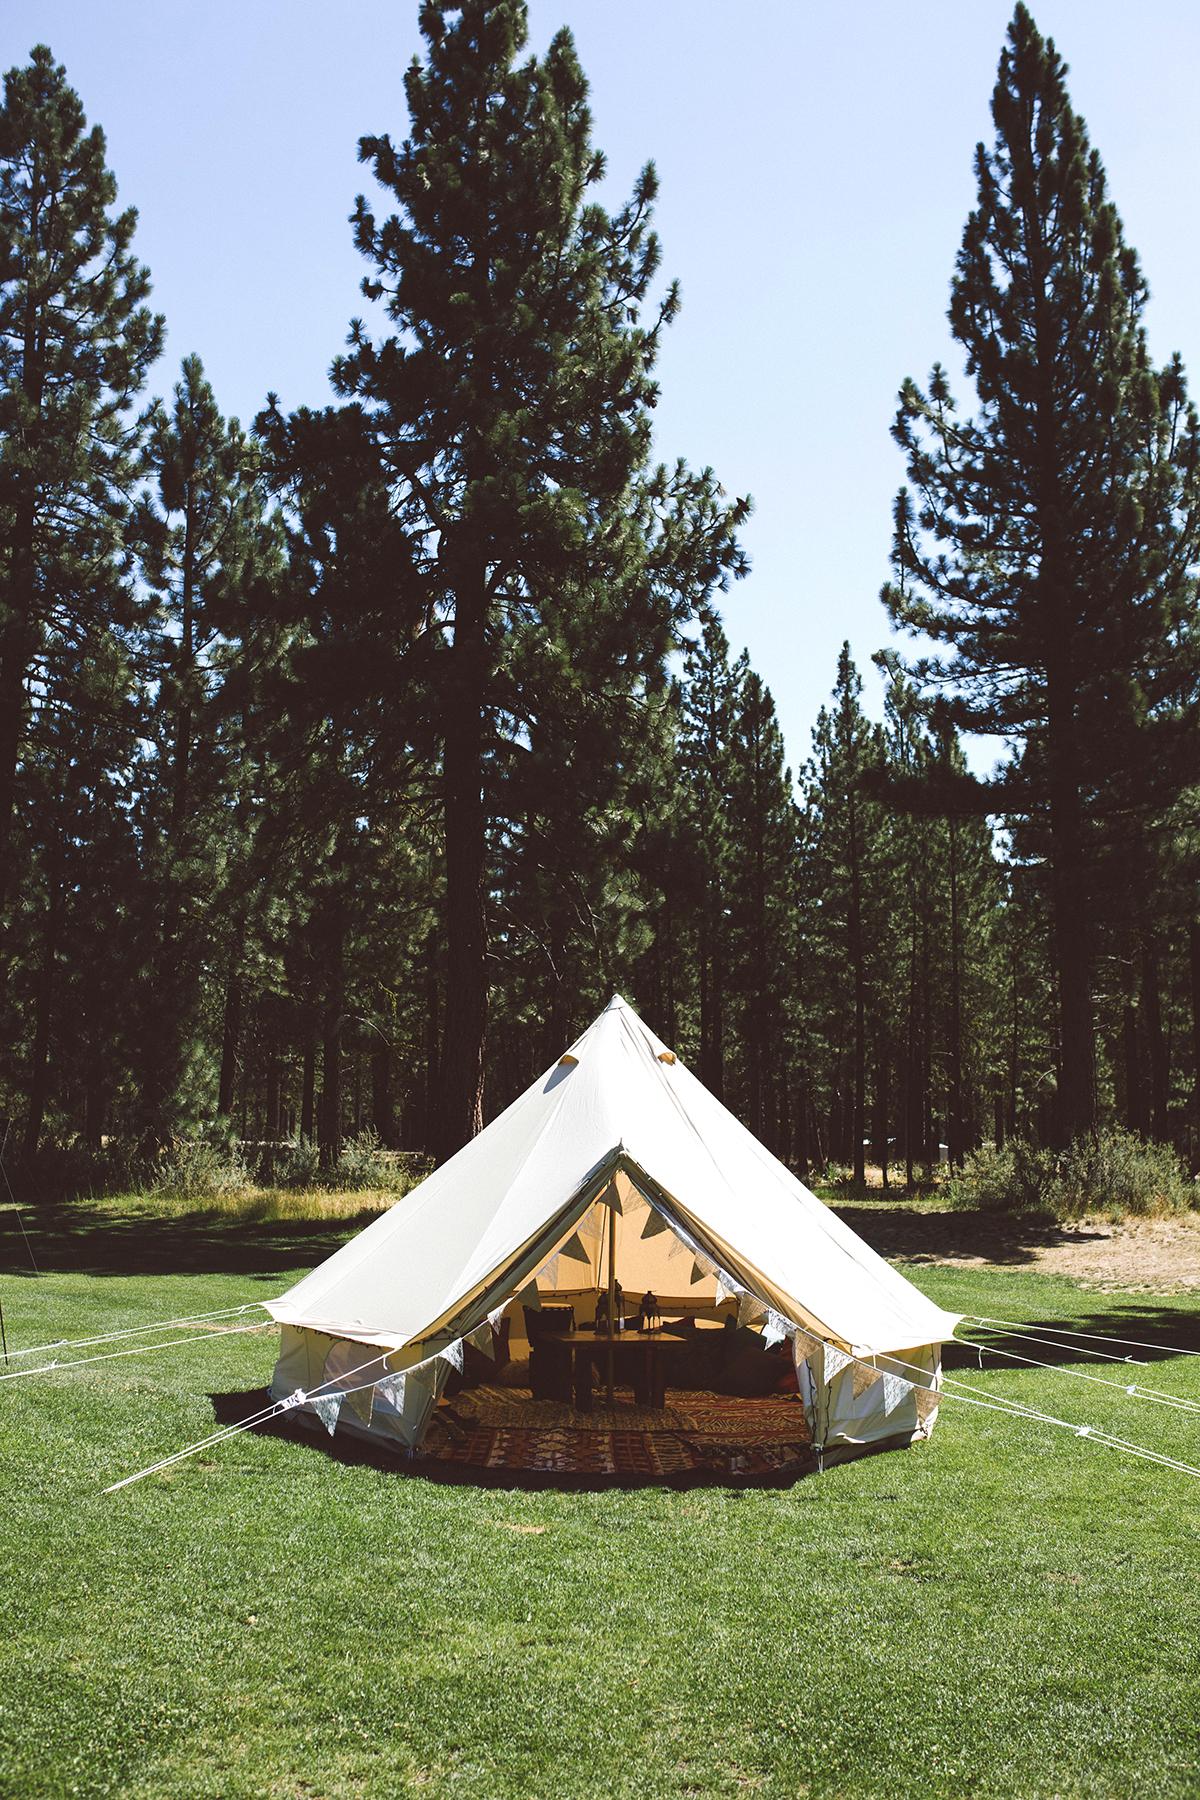 backyard diy circle tent with decorations